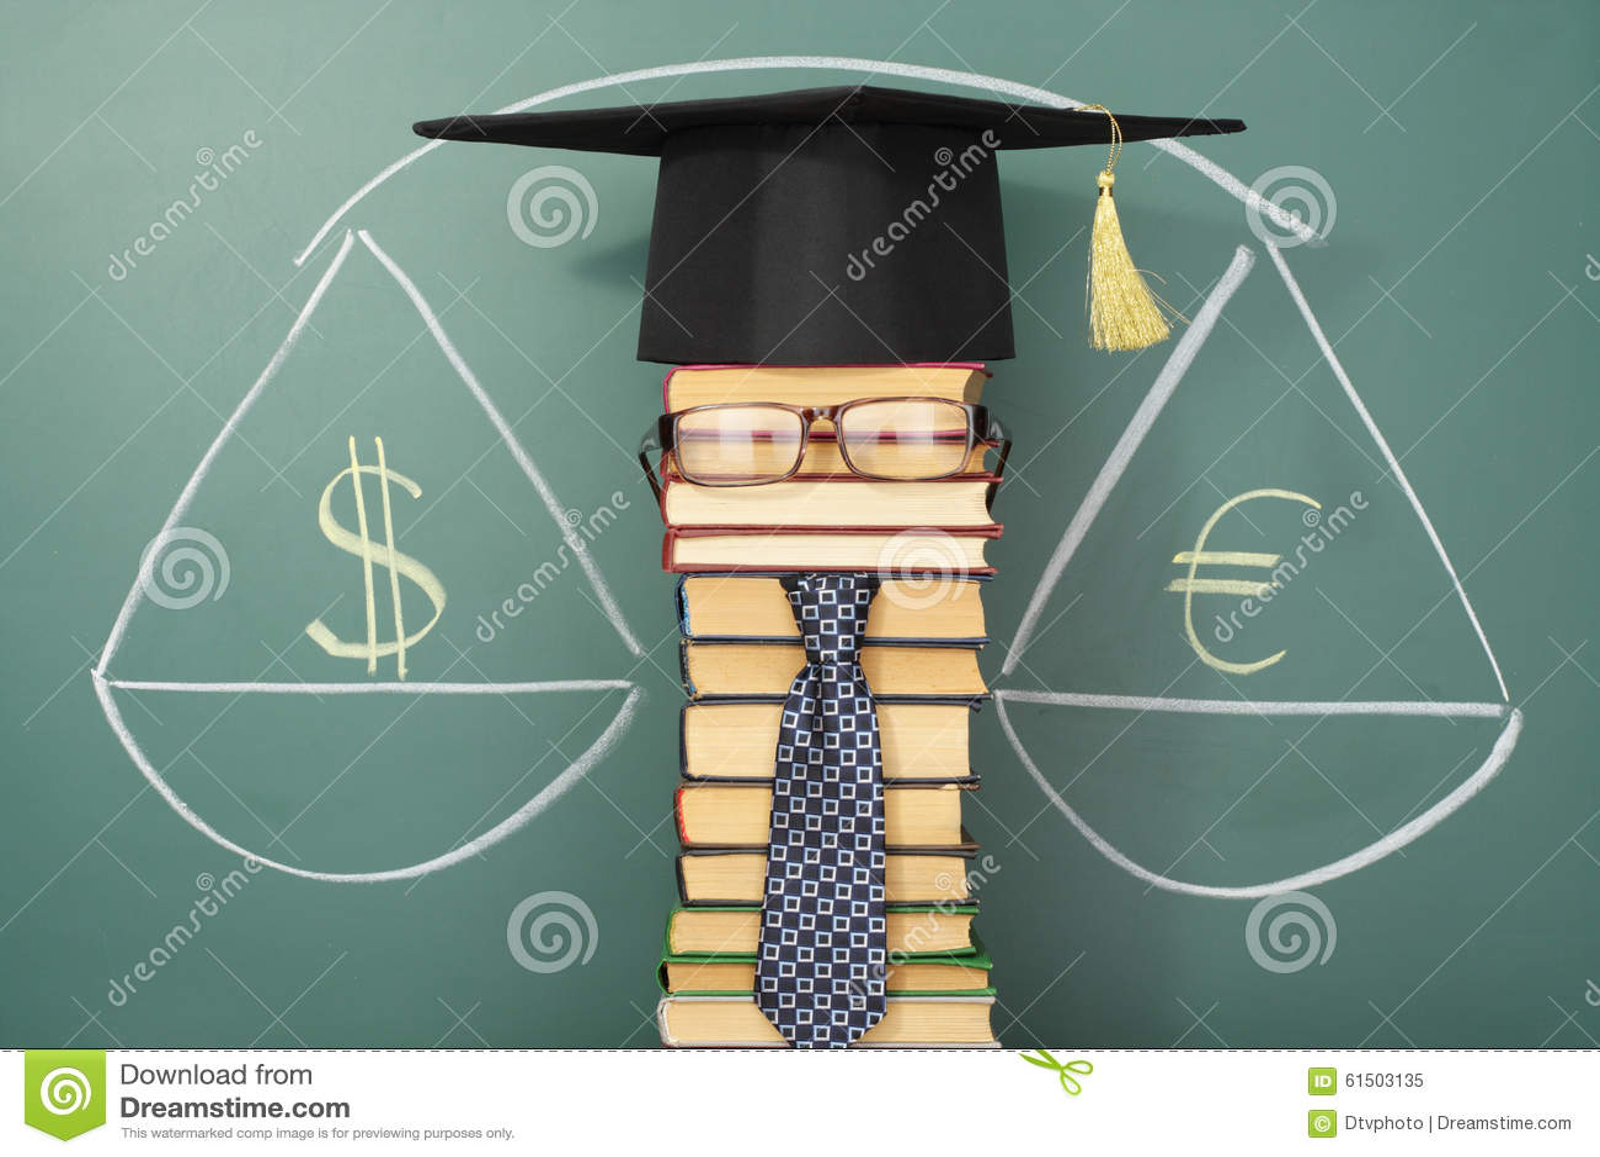 Professor of economics